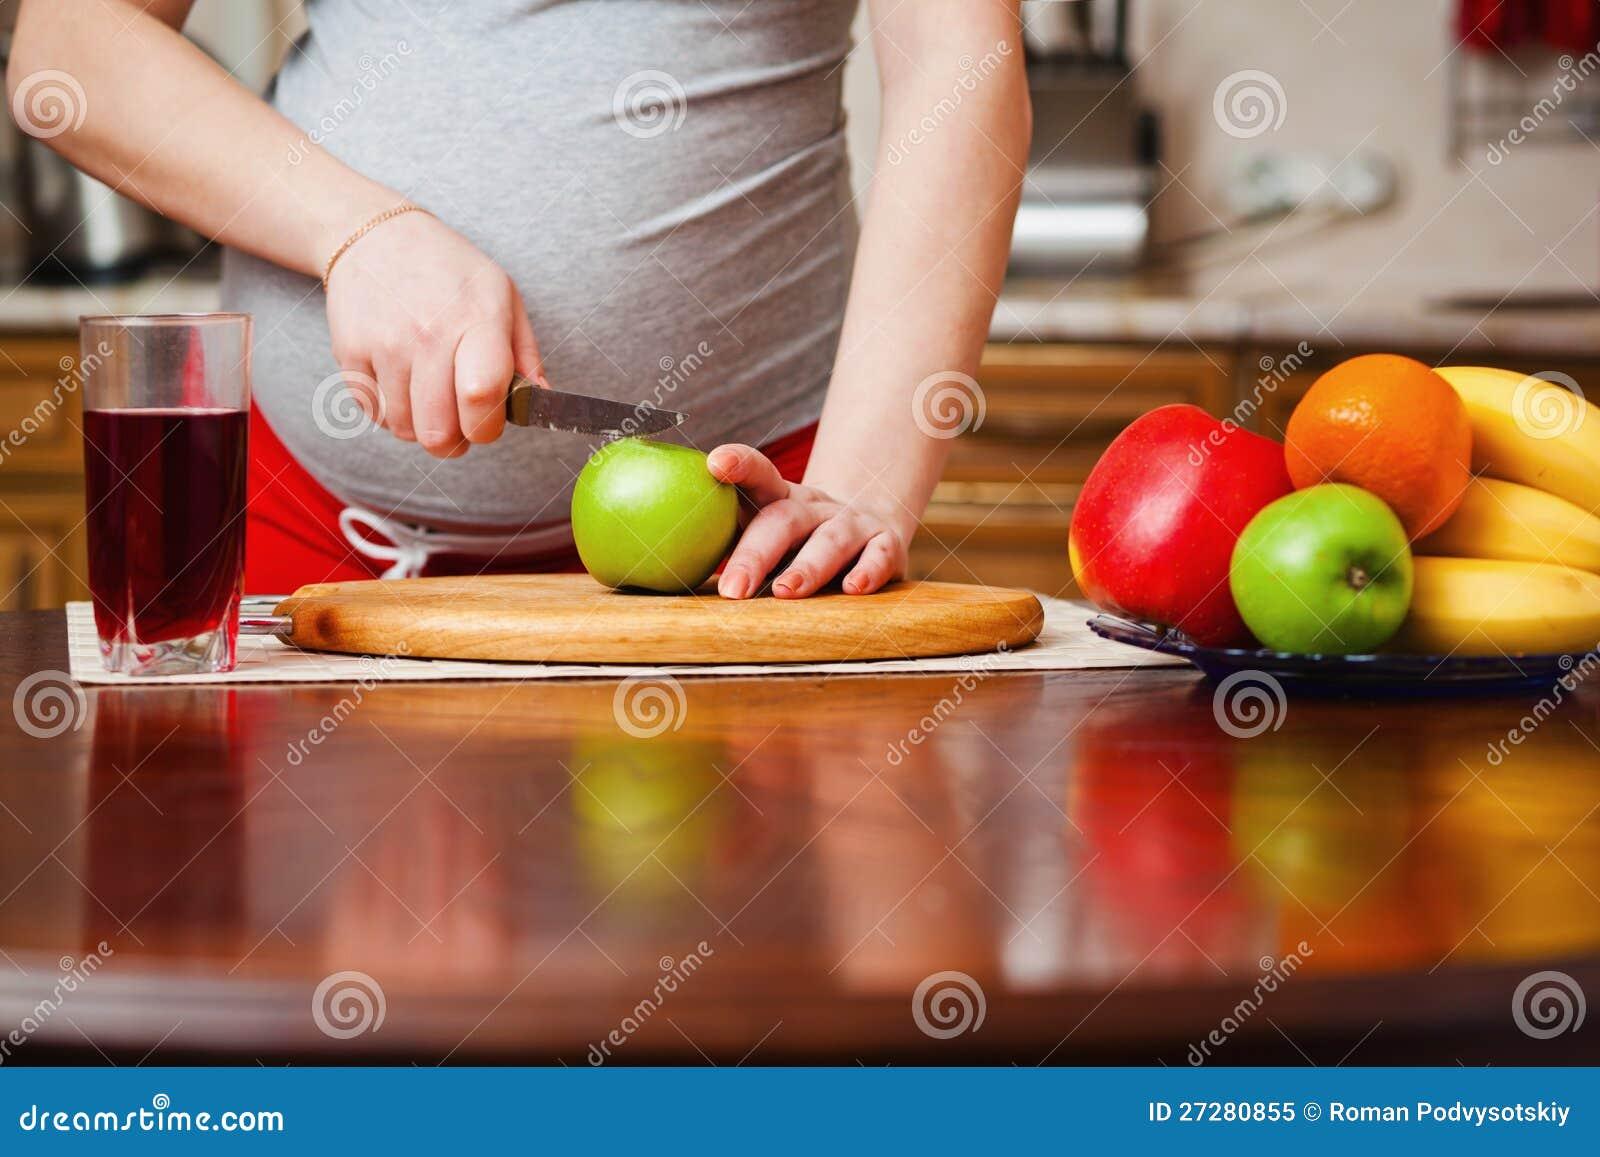 Beautiful pregnant woman on kitchen